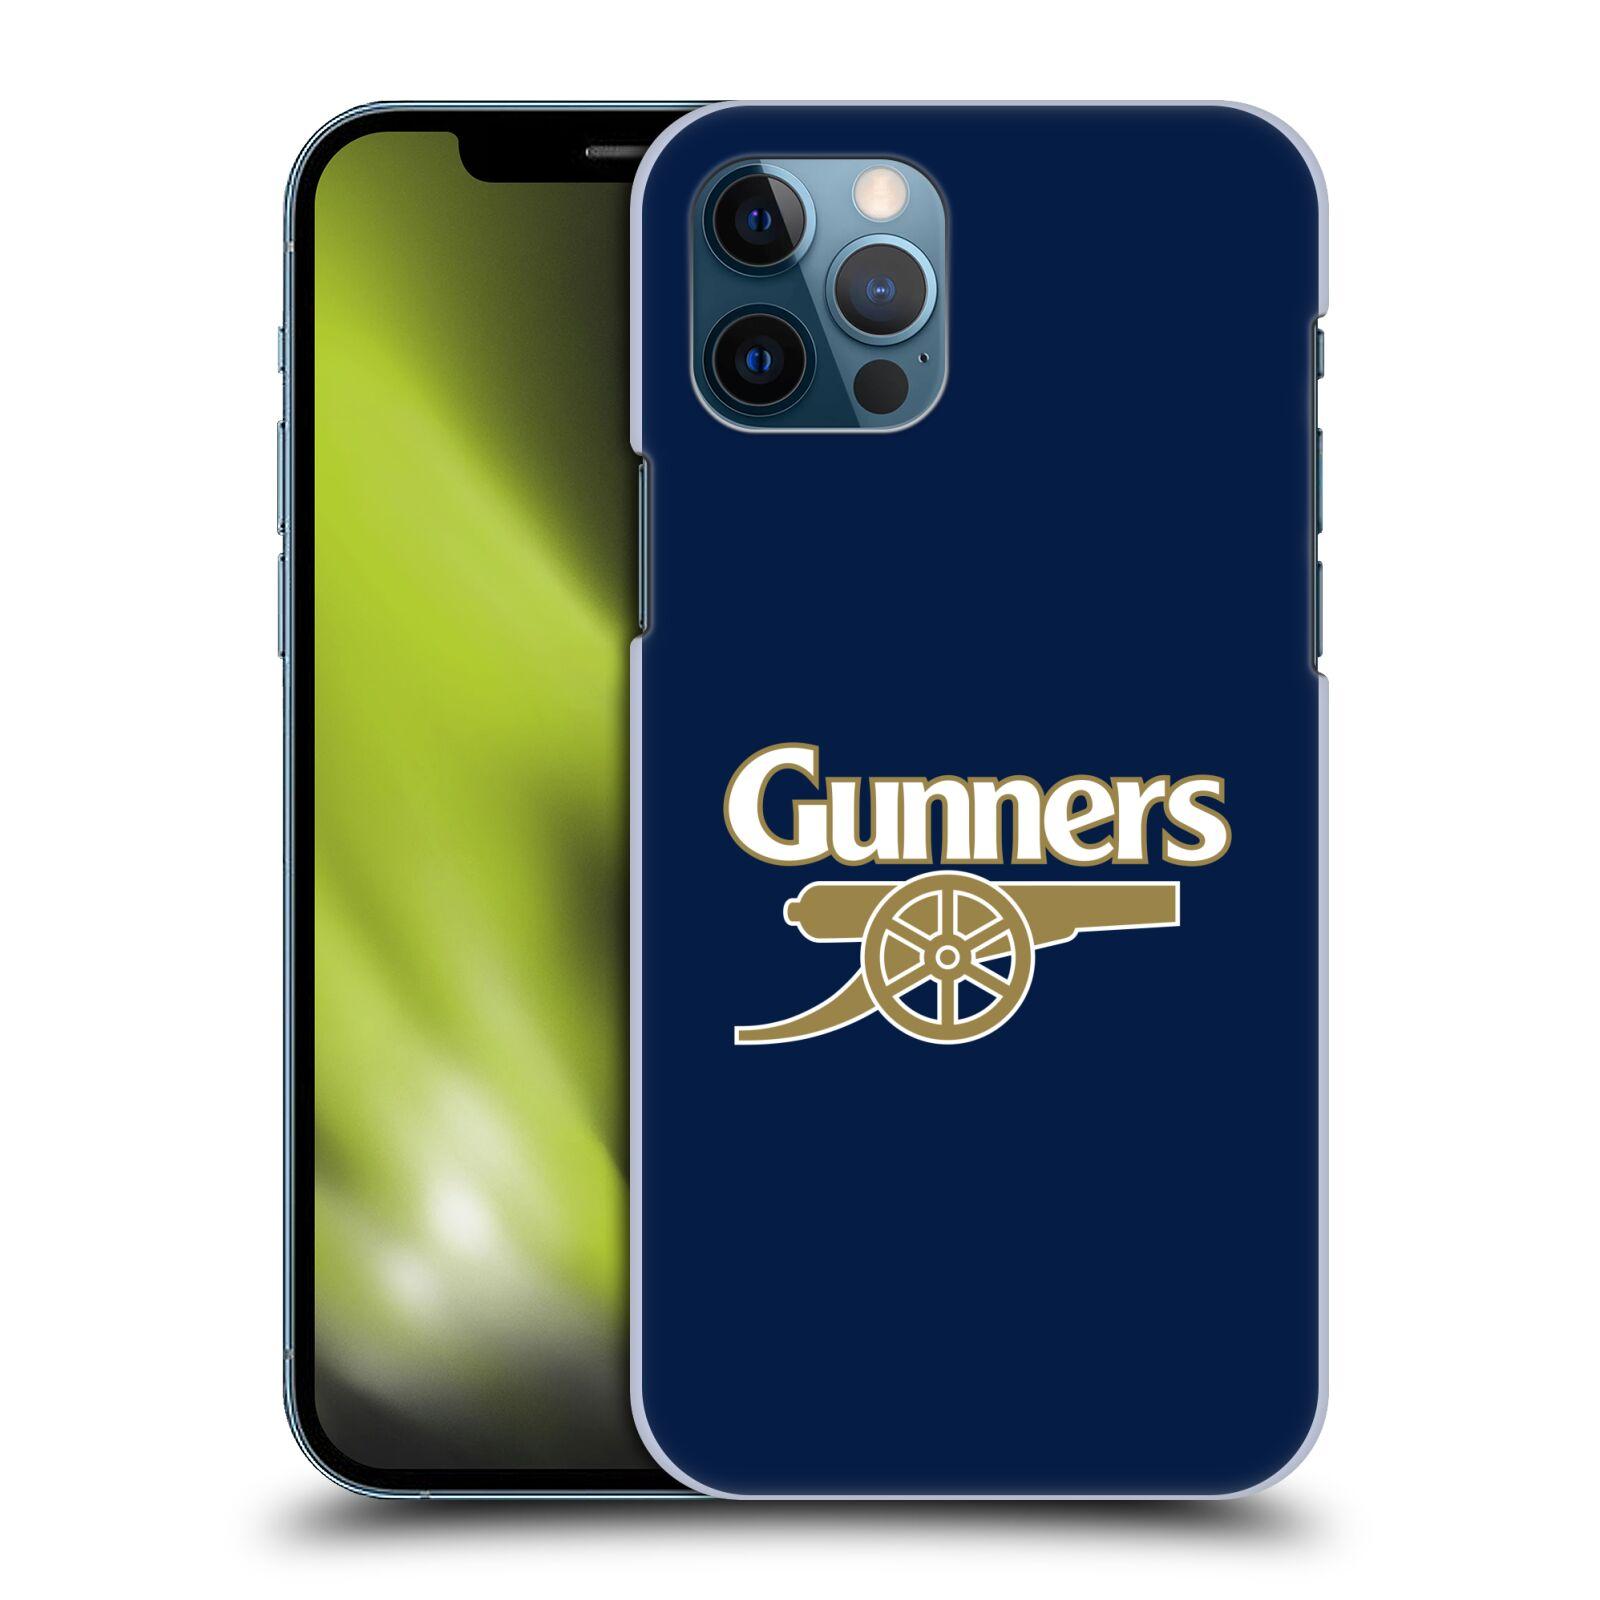 Plastové pouzdro na mobil Apple iPhone 12 / 12 Pro - Head Case - Arsenal FC - Gunners